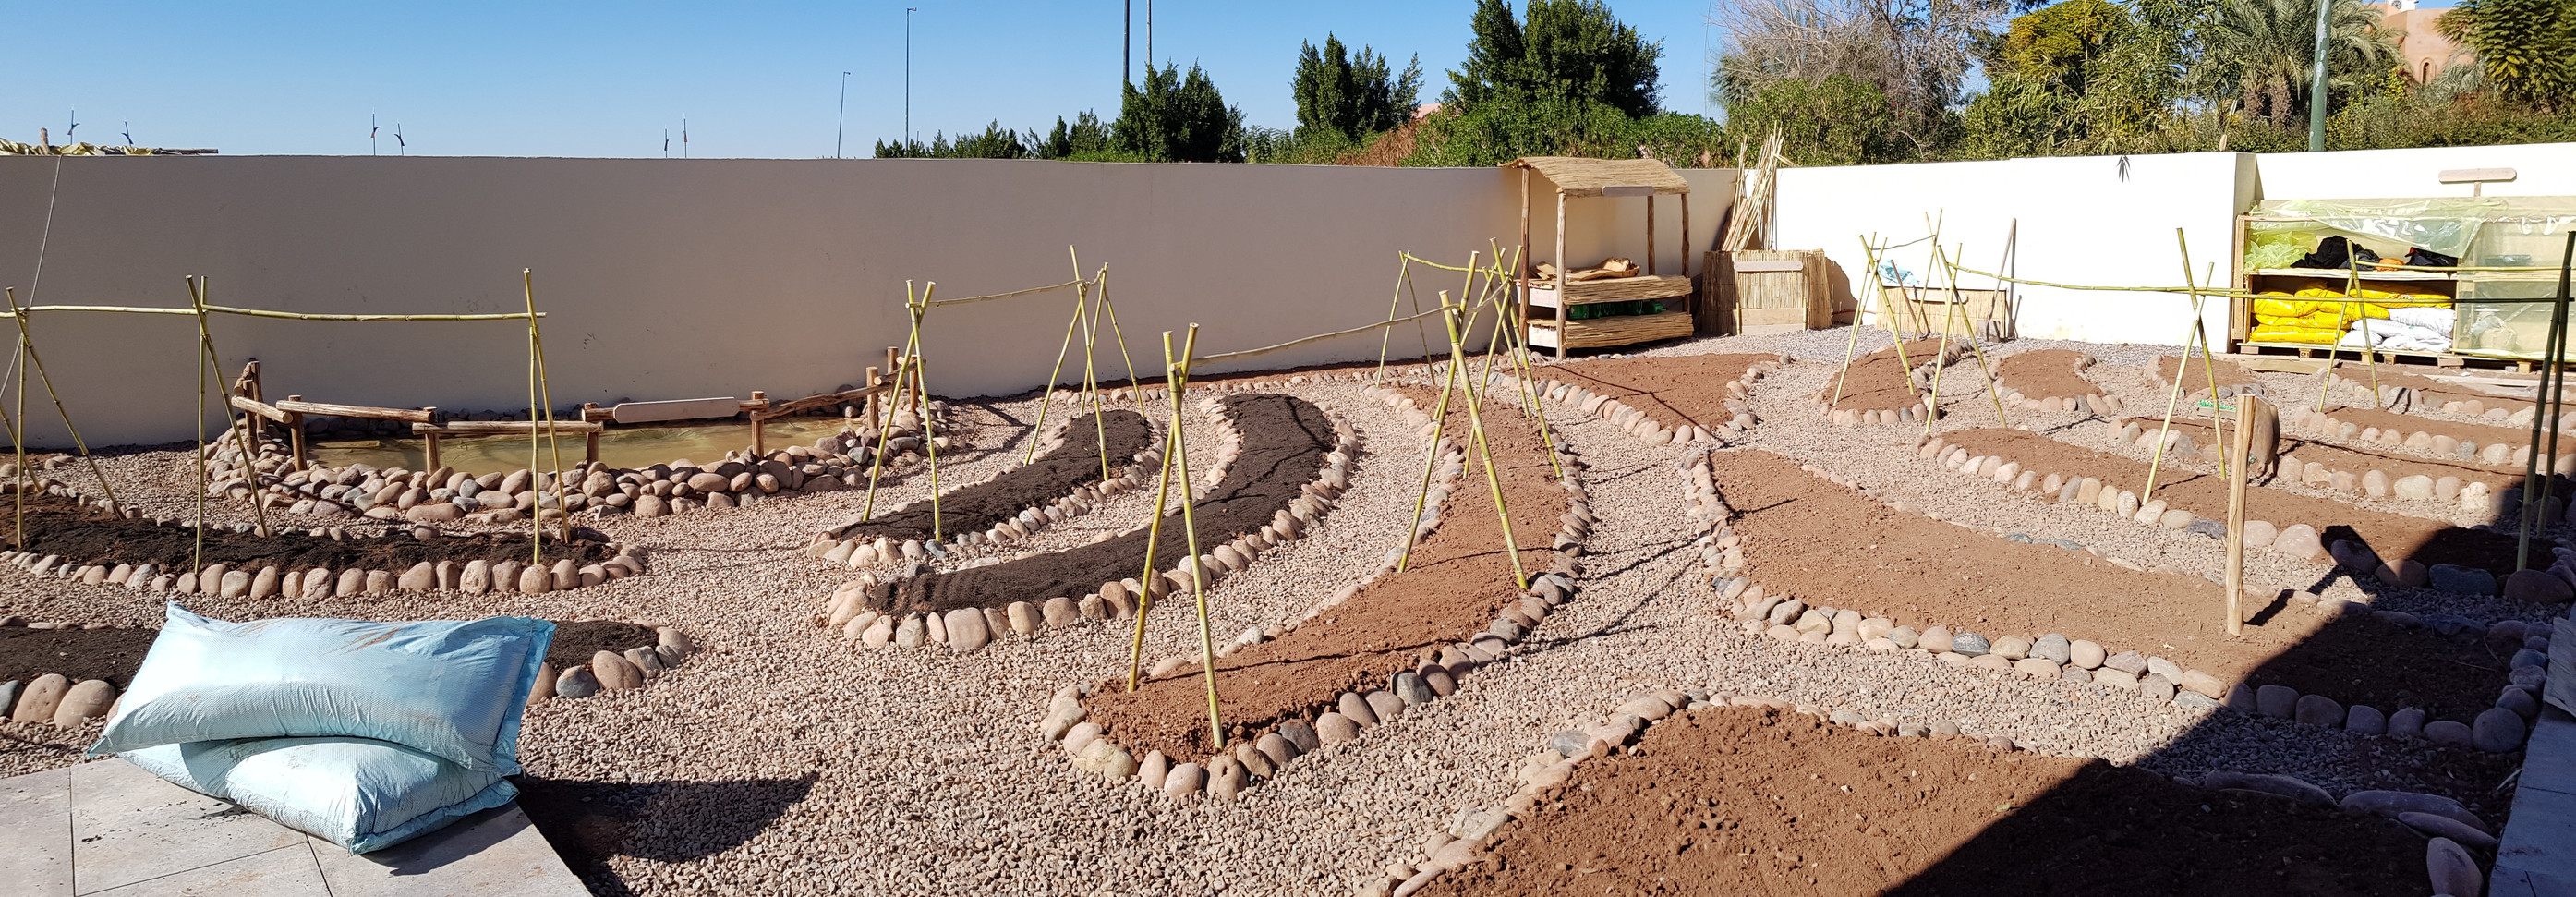 New garden montessori (9).jpg